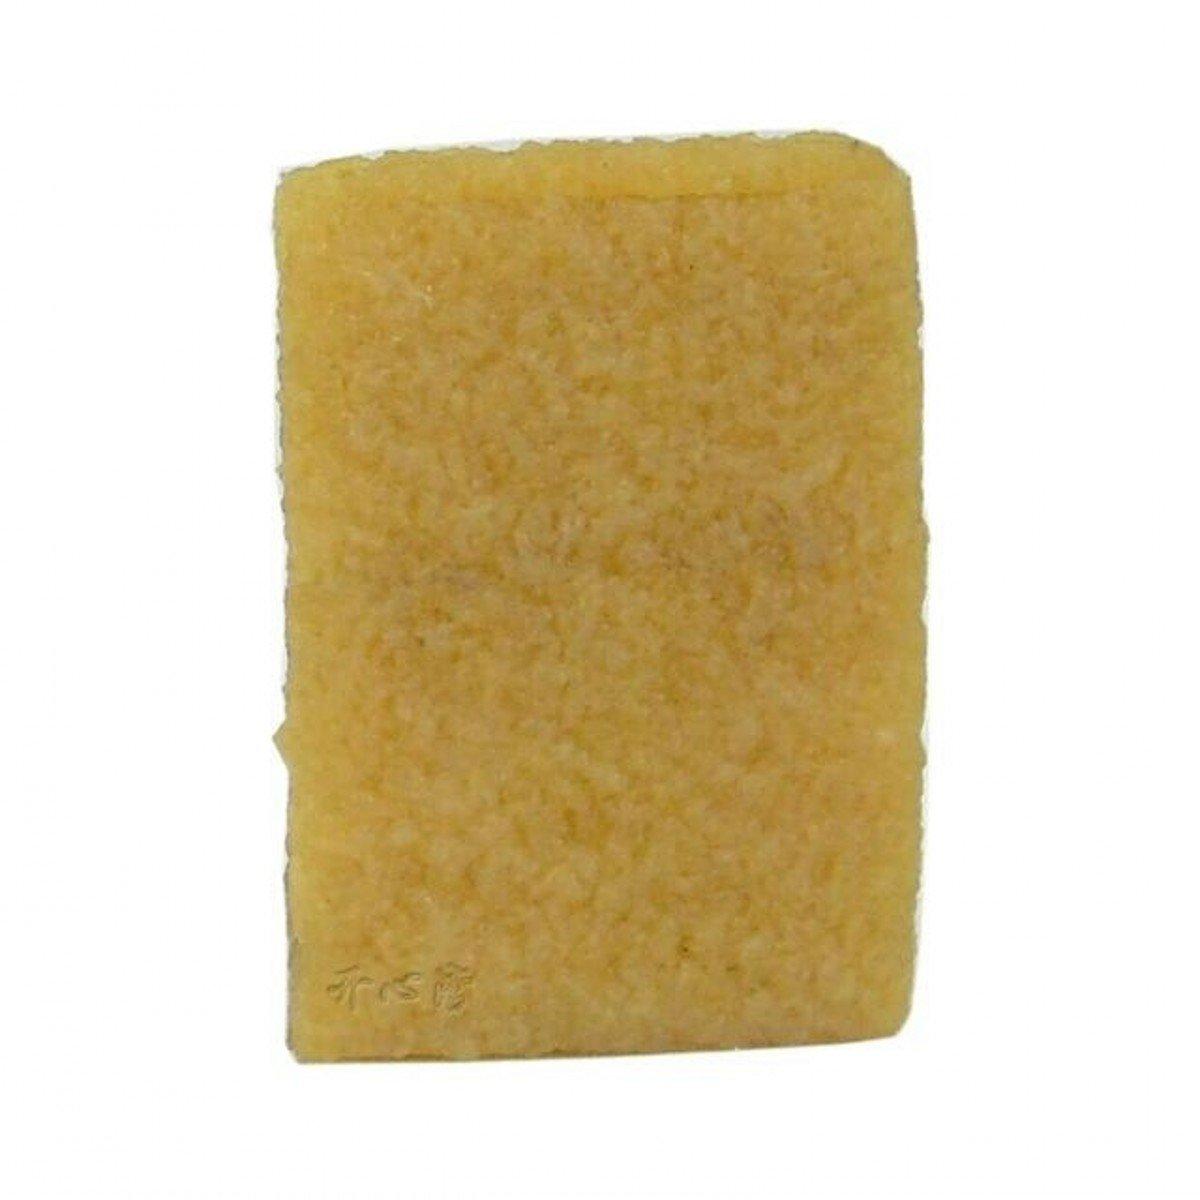 LOT 5 Pieces Crepe Rubber Eraser Adhesive Eraser Caoutchouc For Leathercraft Diy Work 7*5*1CM